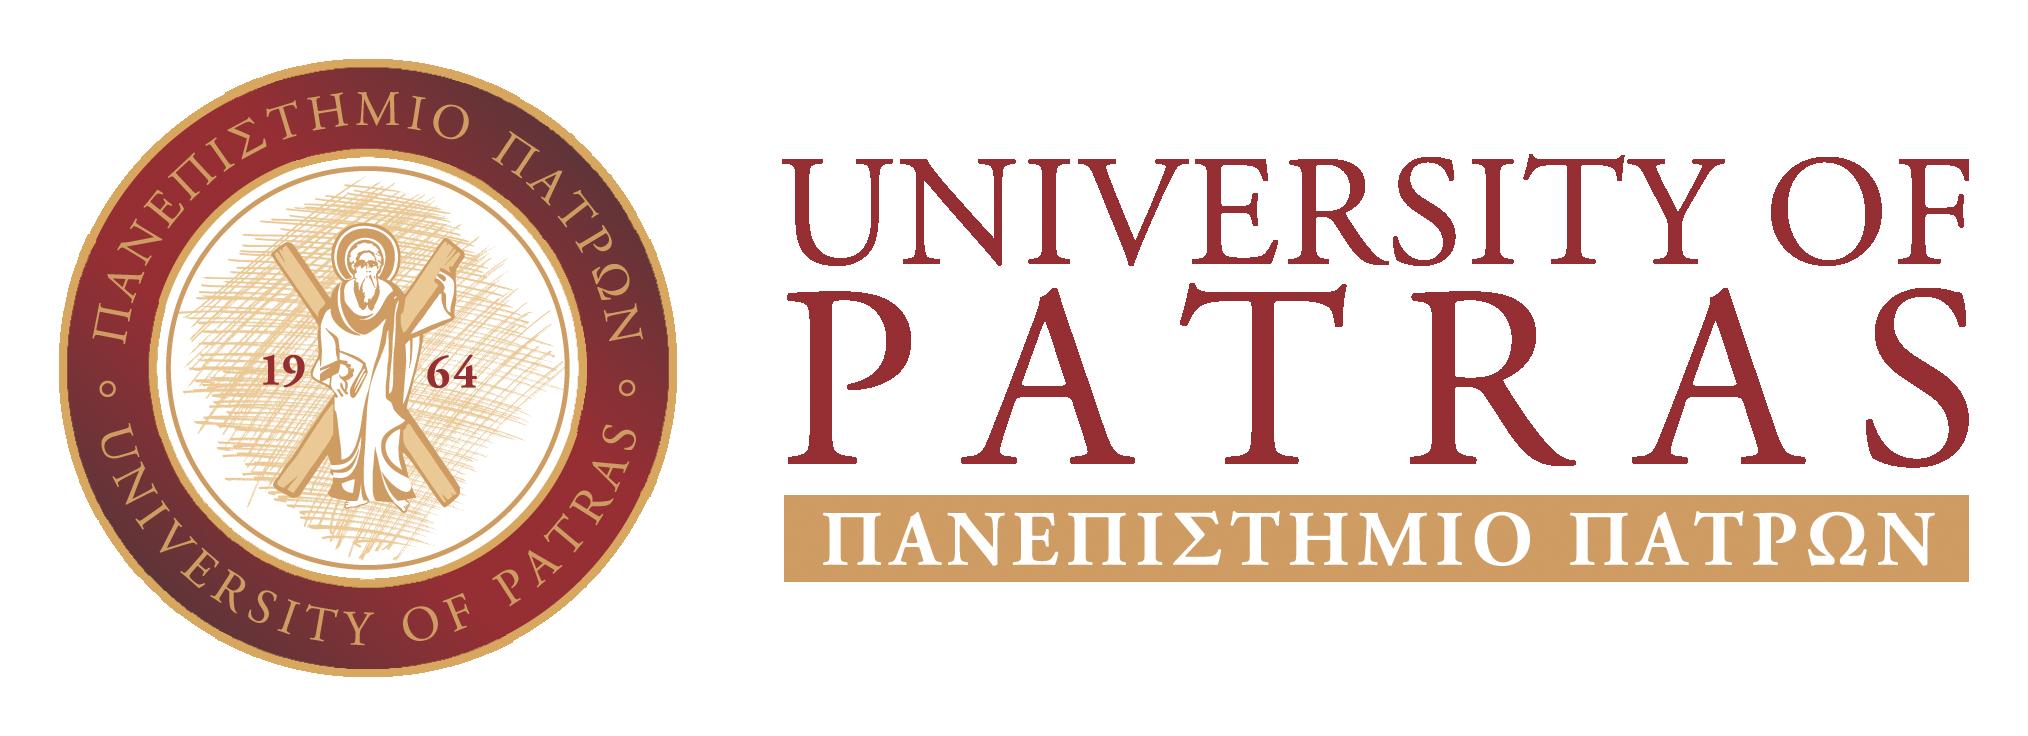 patras university